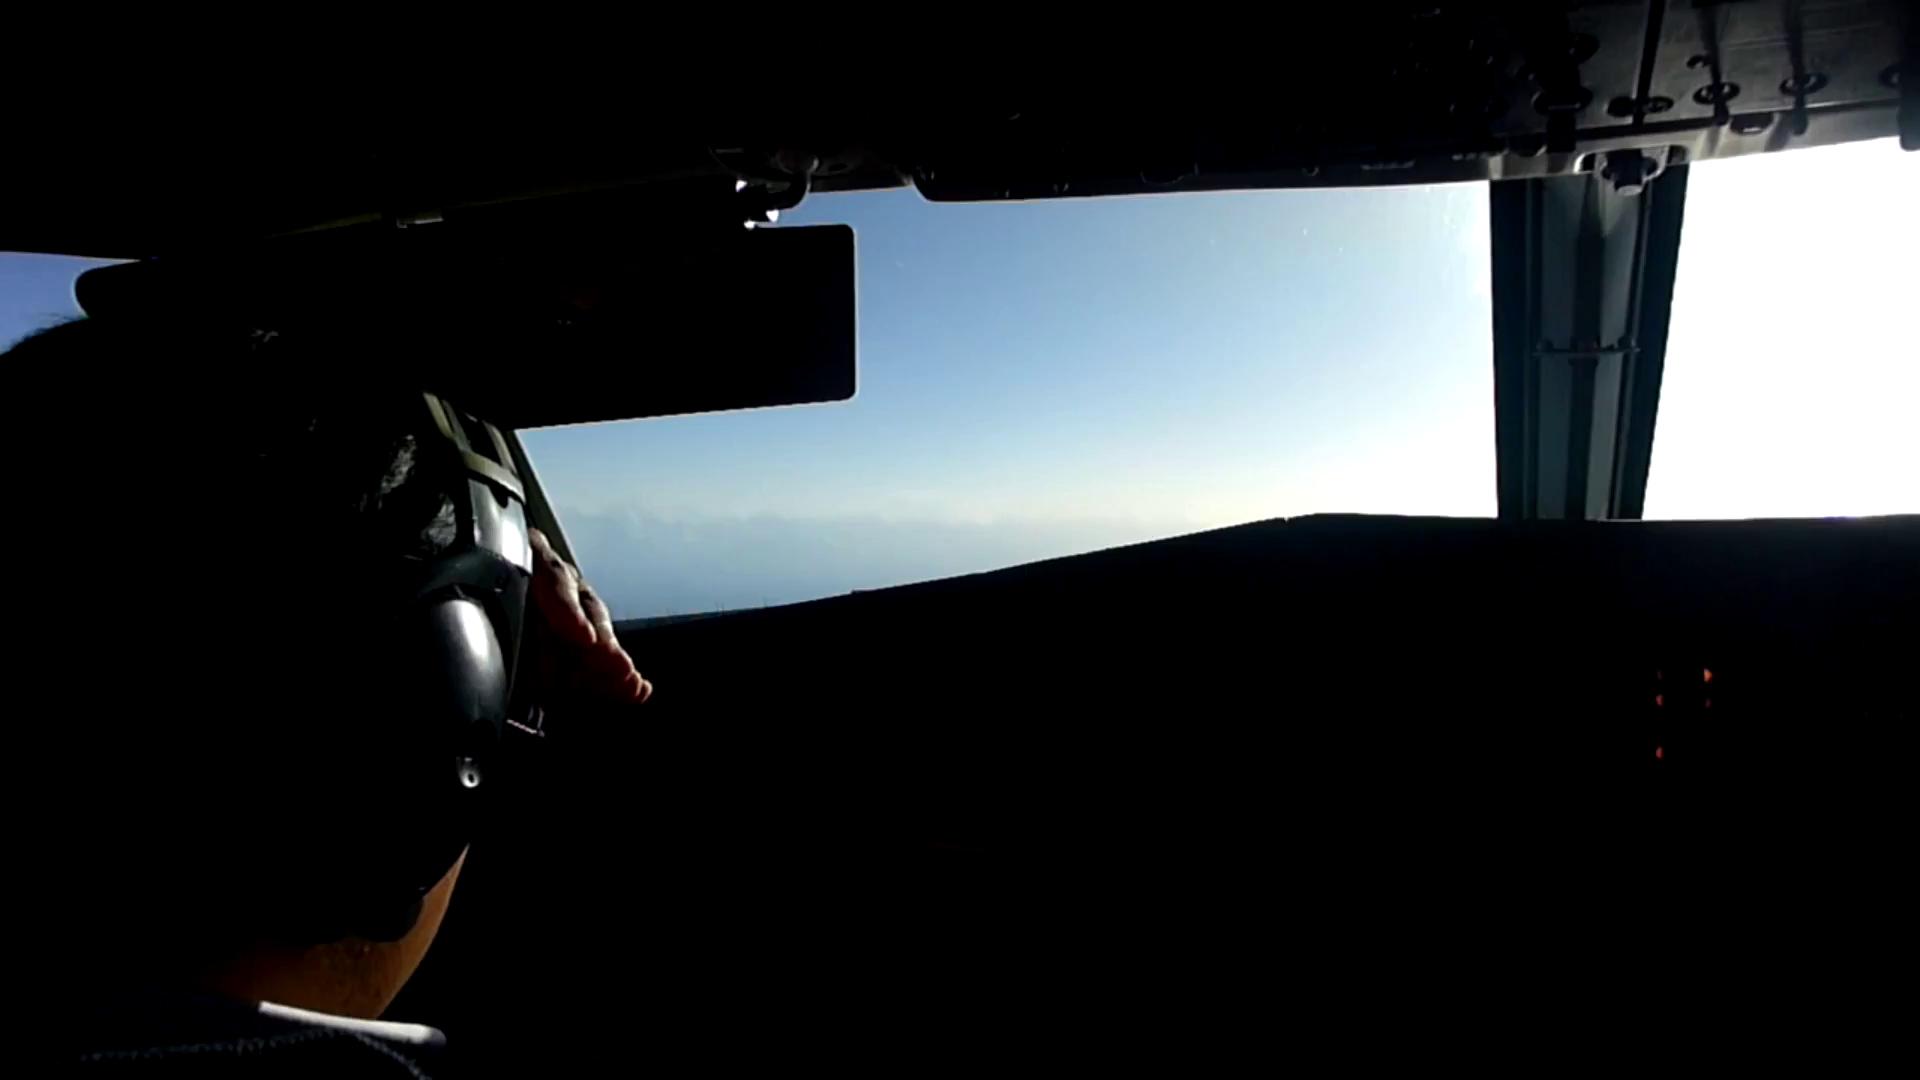 Everest Flight Nepal Video 2014